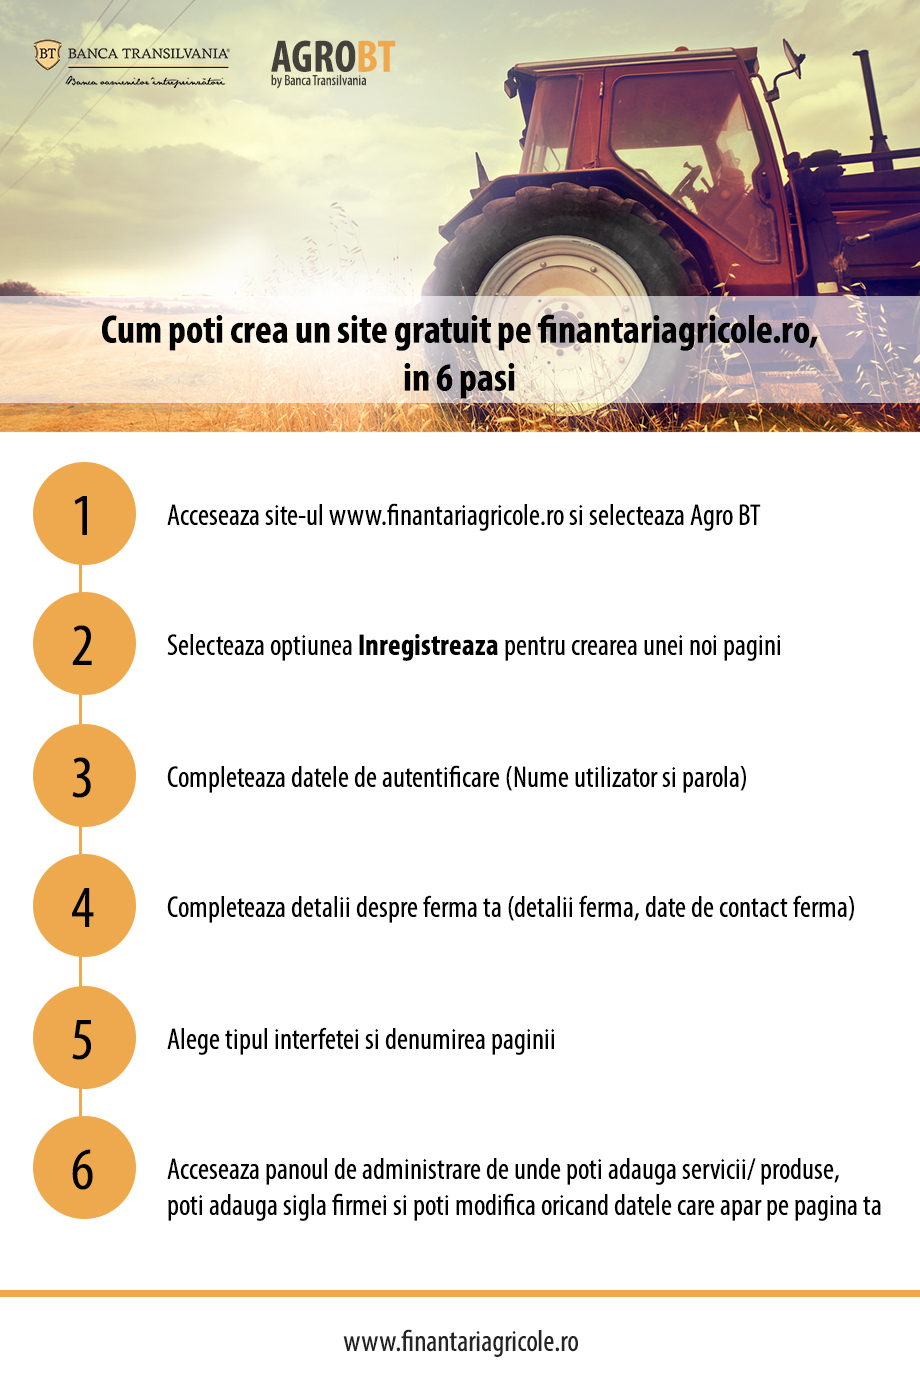 Infografic BT: Cum poti crea un site gratuit pe finantariagricole.ro, in 6 pasi